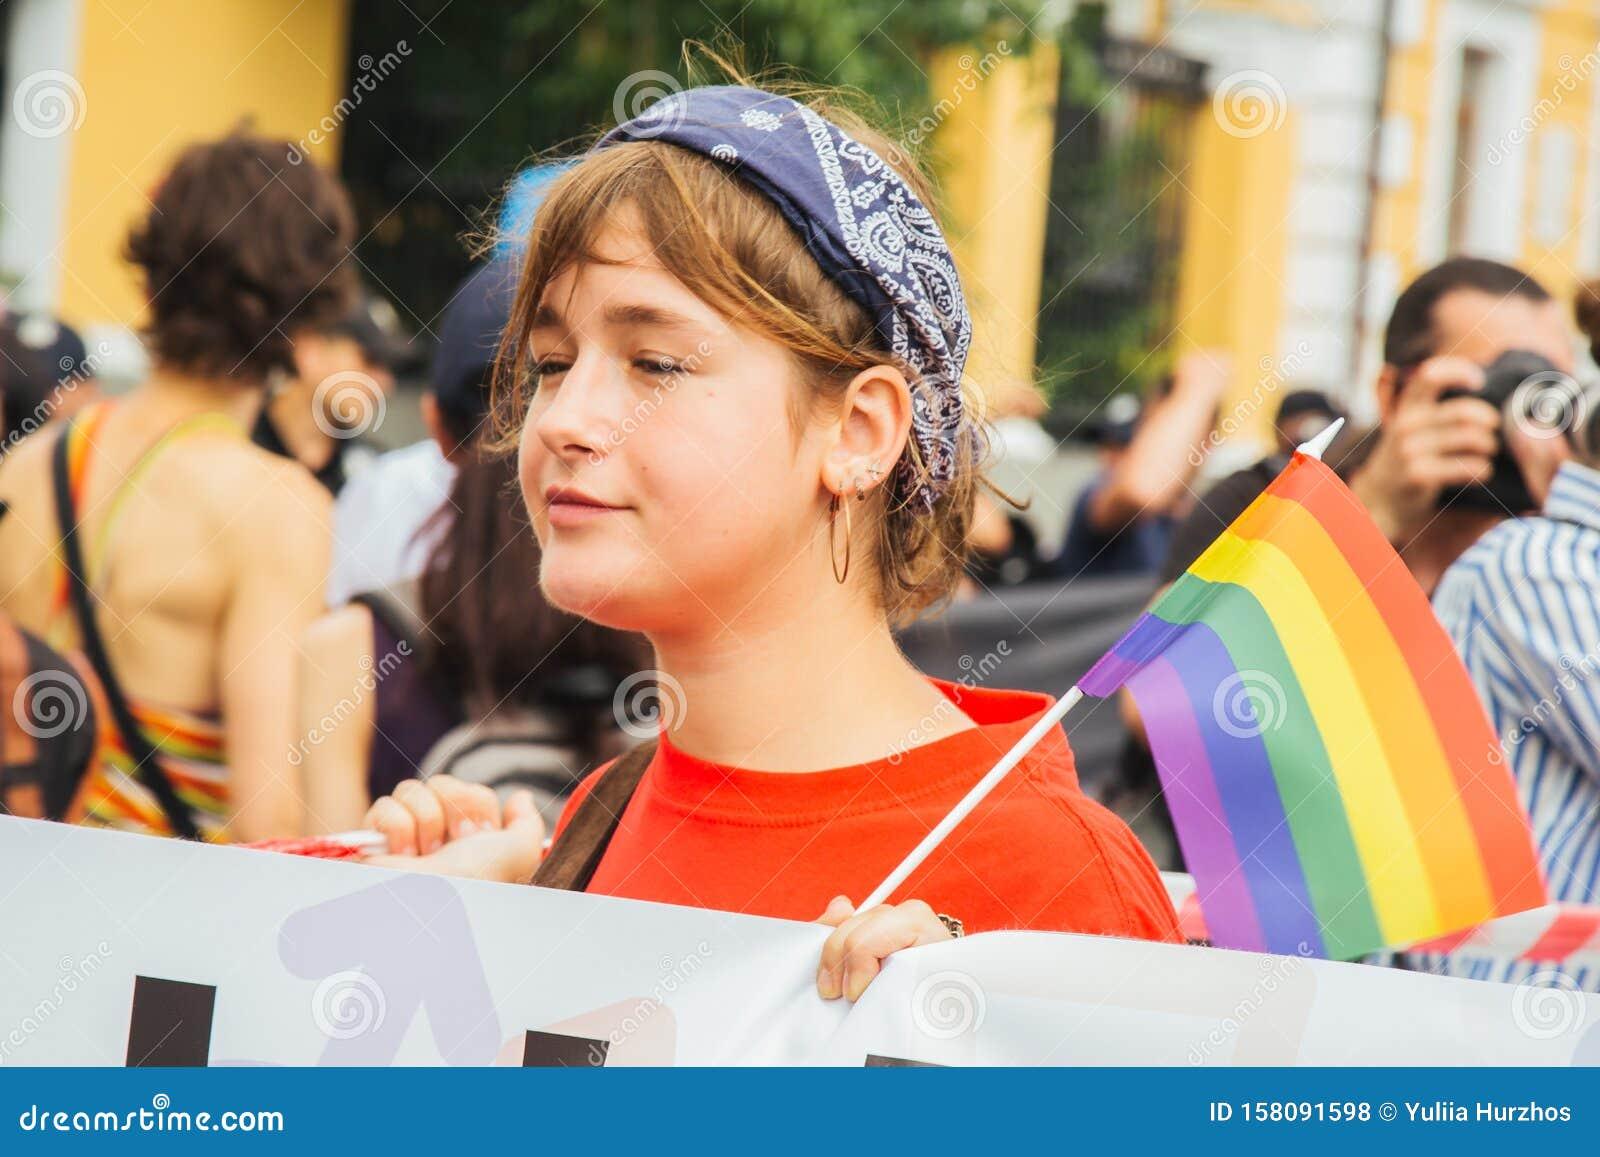 Transvestite pictures non gay